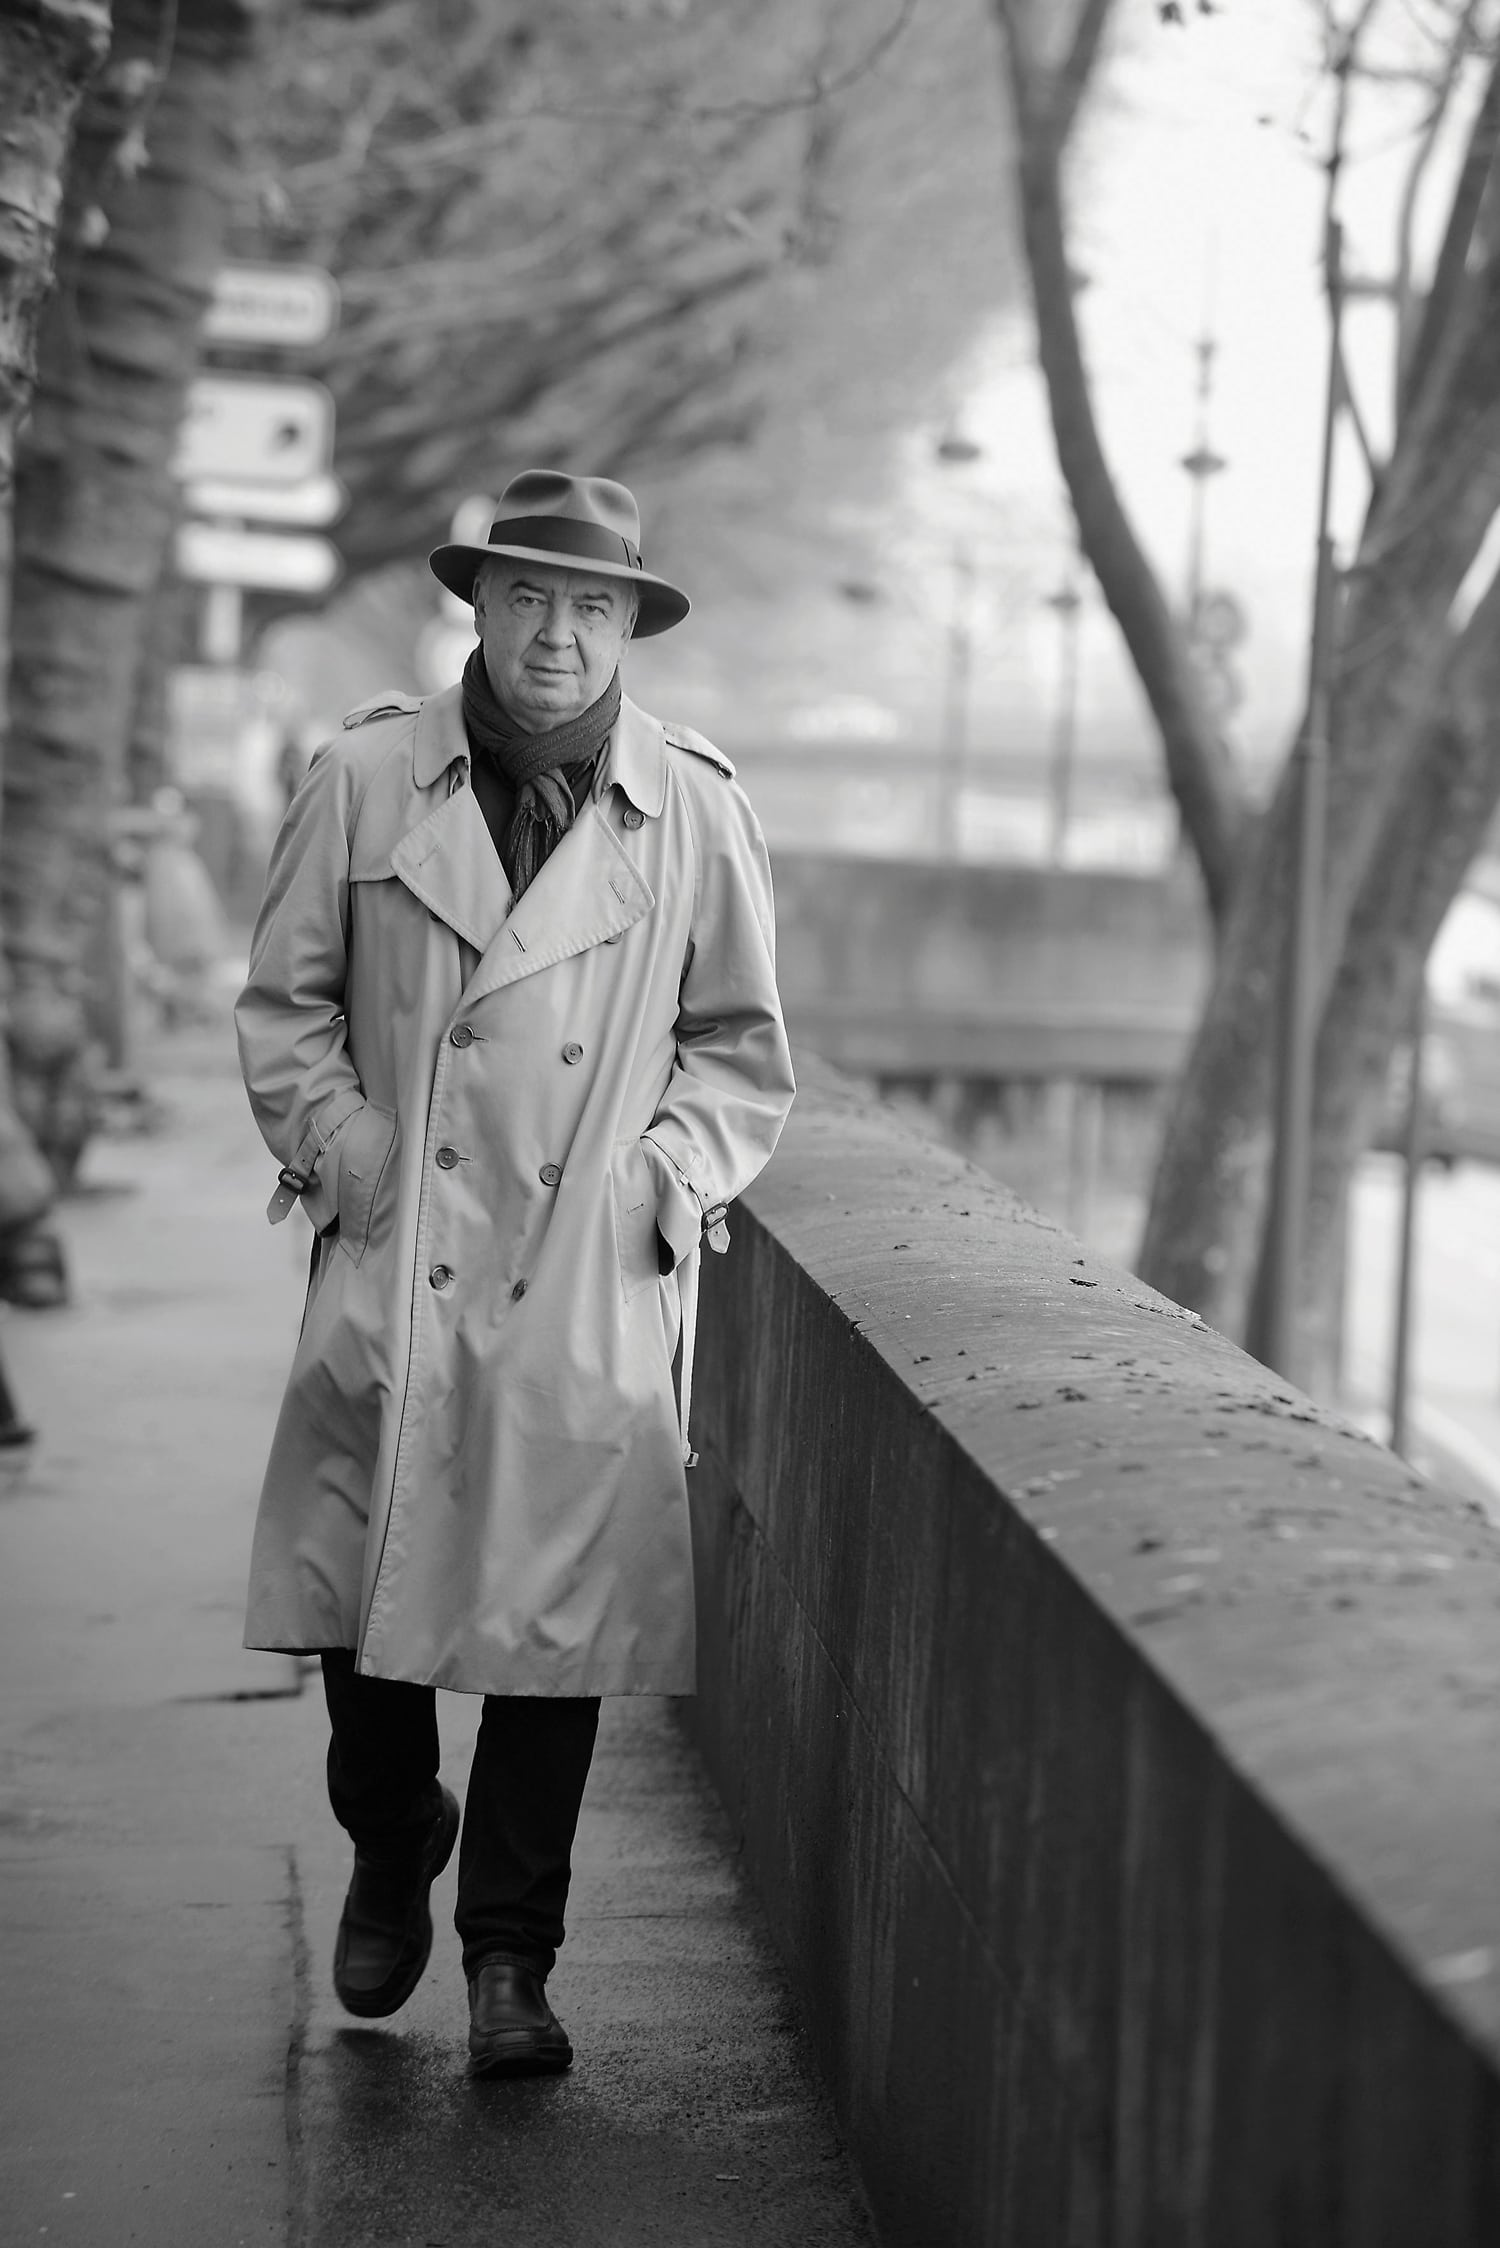 Jean-Pierre Perrin et ses histoires burgondo-orientales